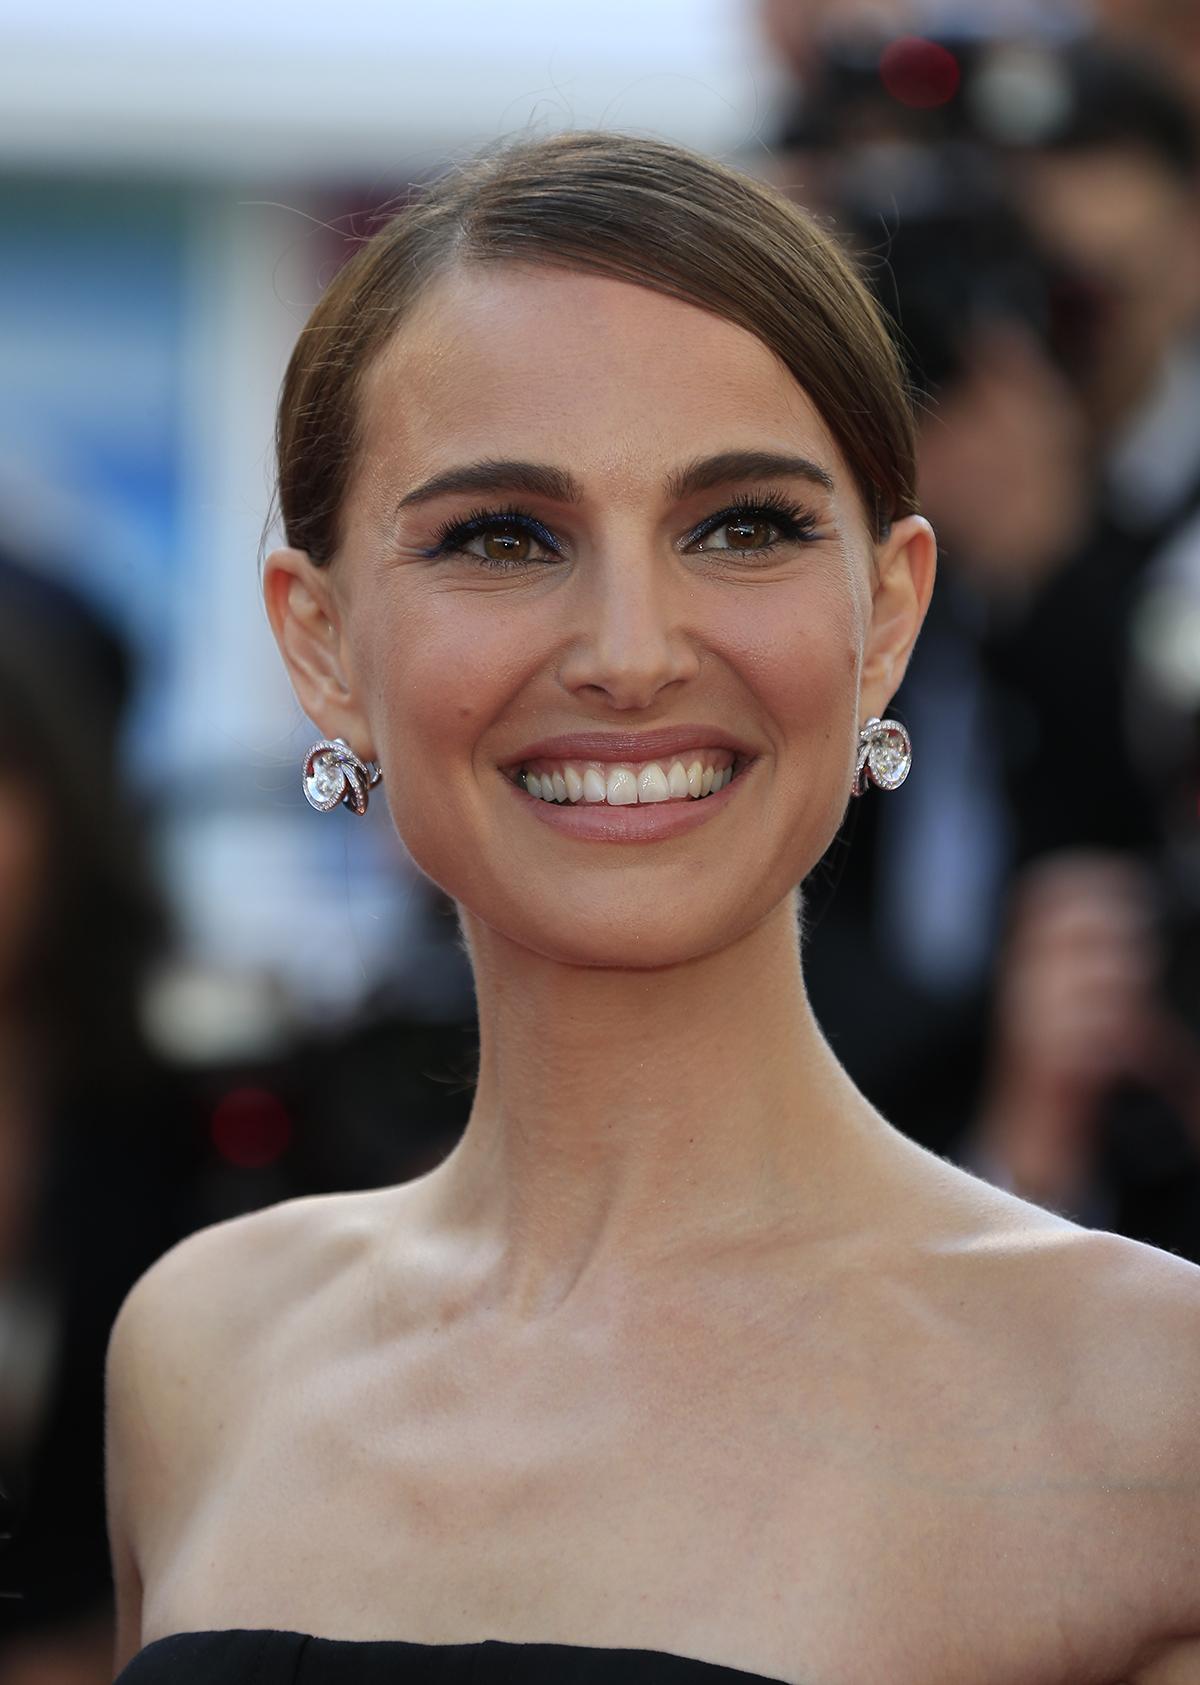 Natalie Portman trägt briolette-cut Diamanten Ohrringe von de Grisogono (Chiocciolina)